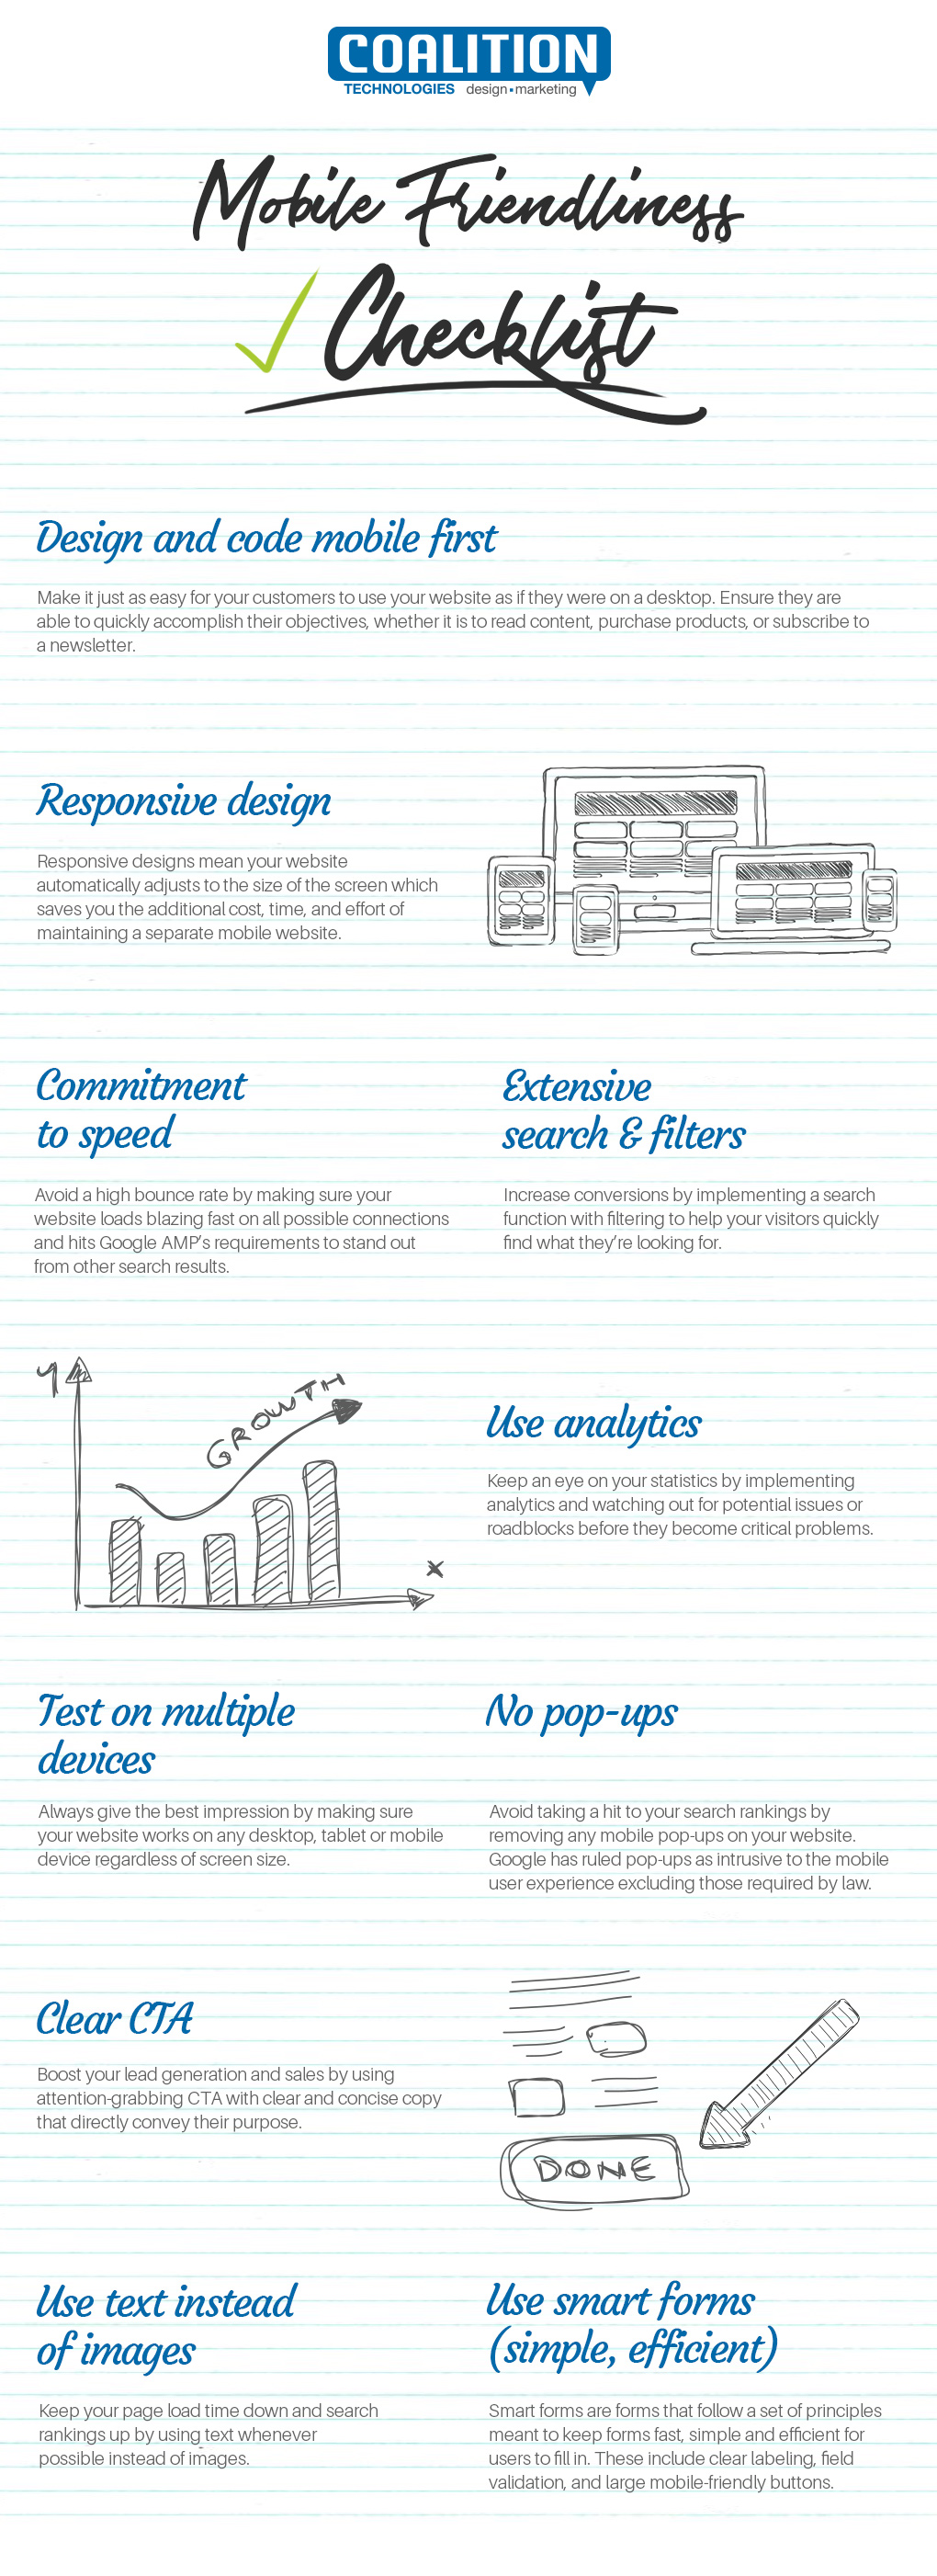 Mobile Friendliness Checklist: 8 Key Factors